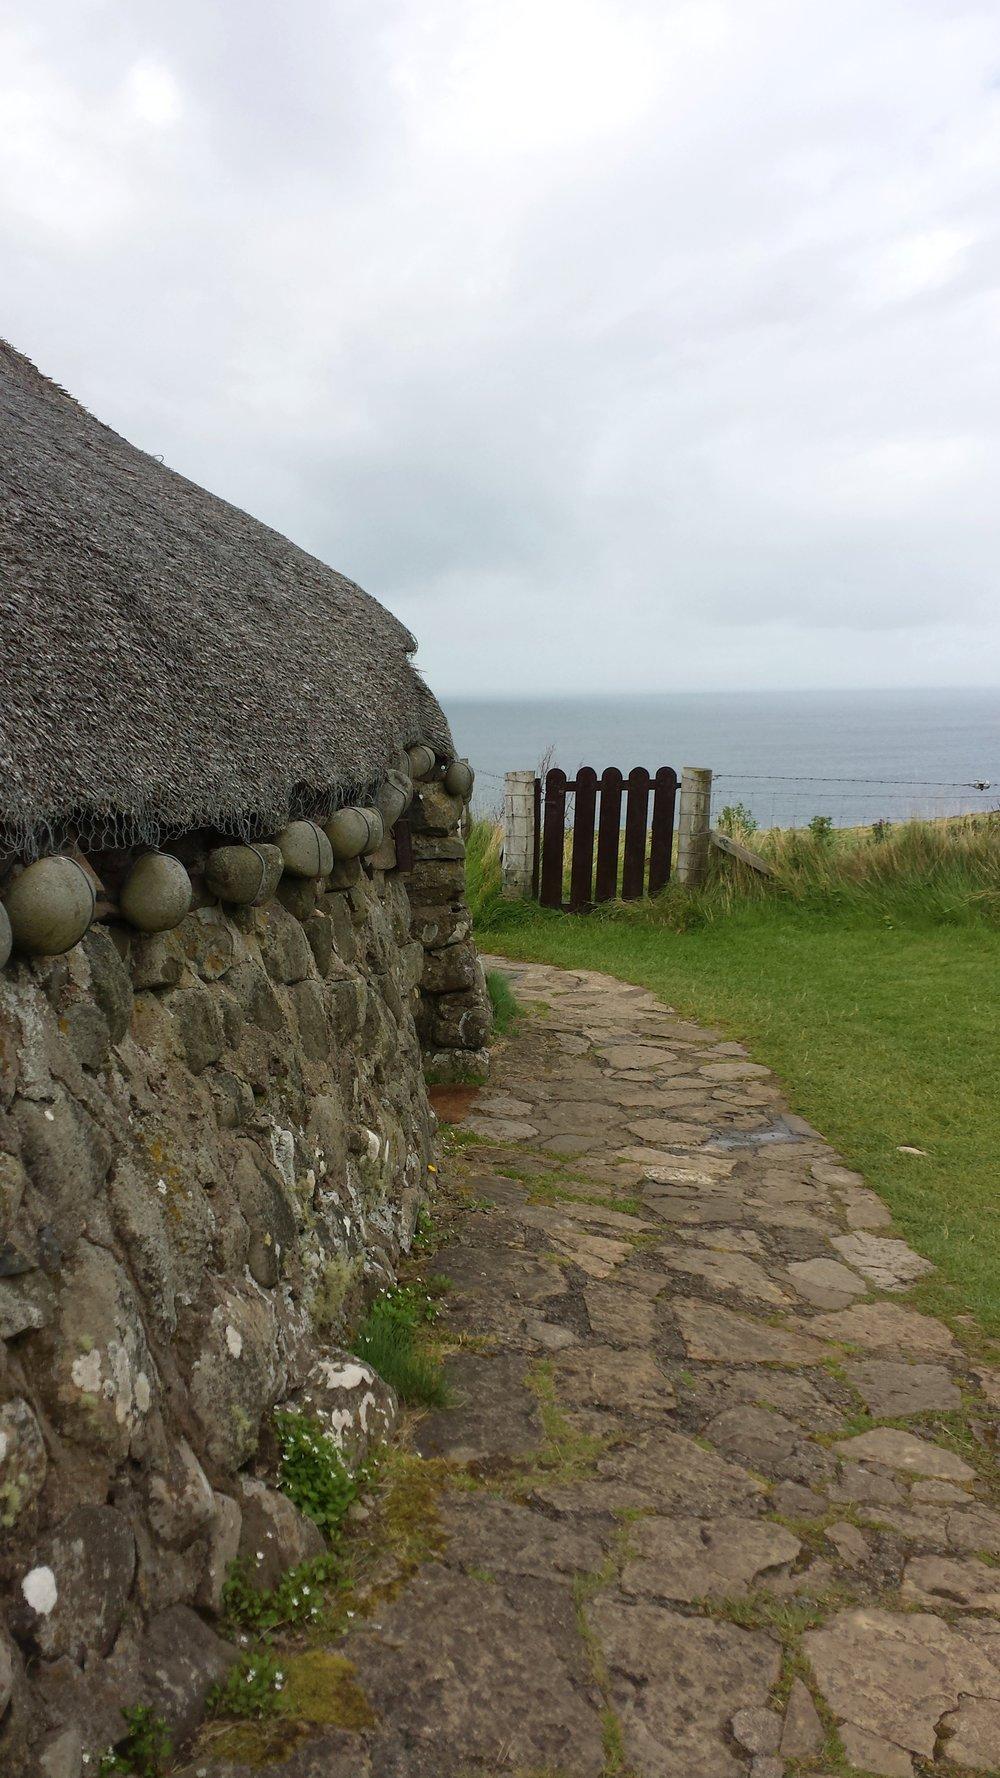 20160903_140027 Skye Mus of Island Life.jpg